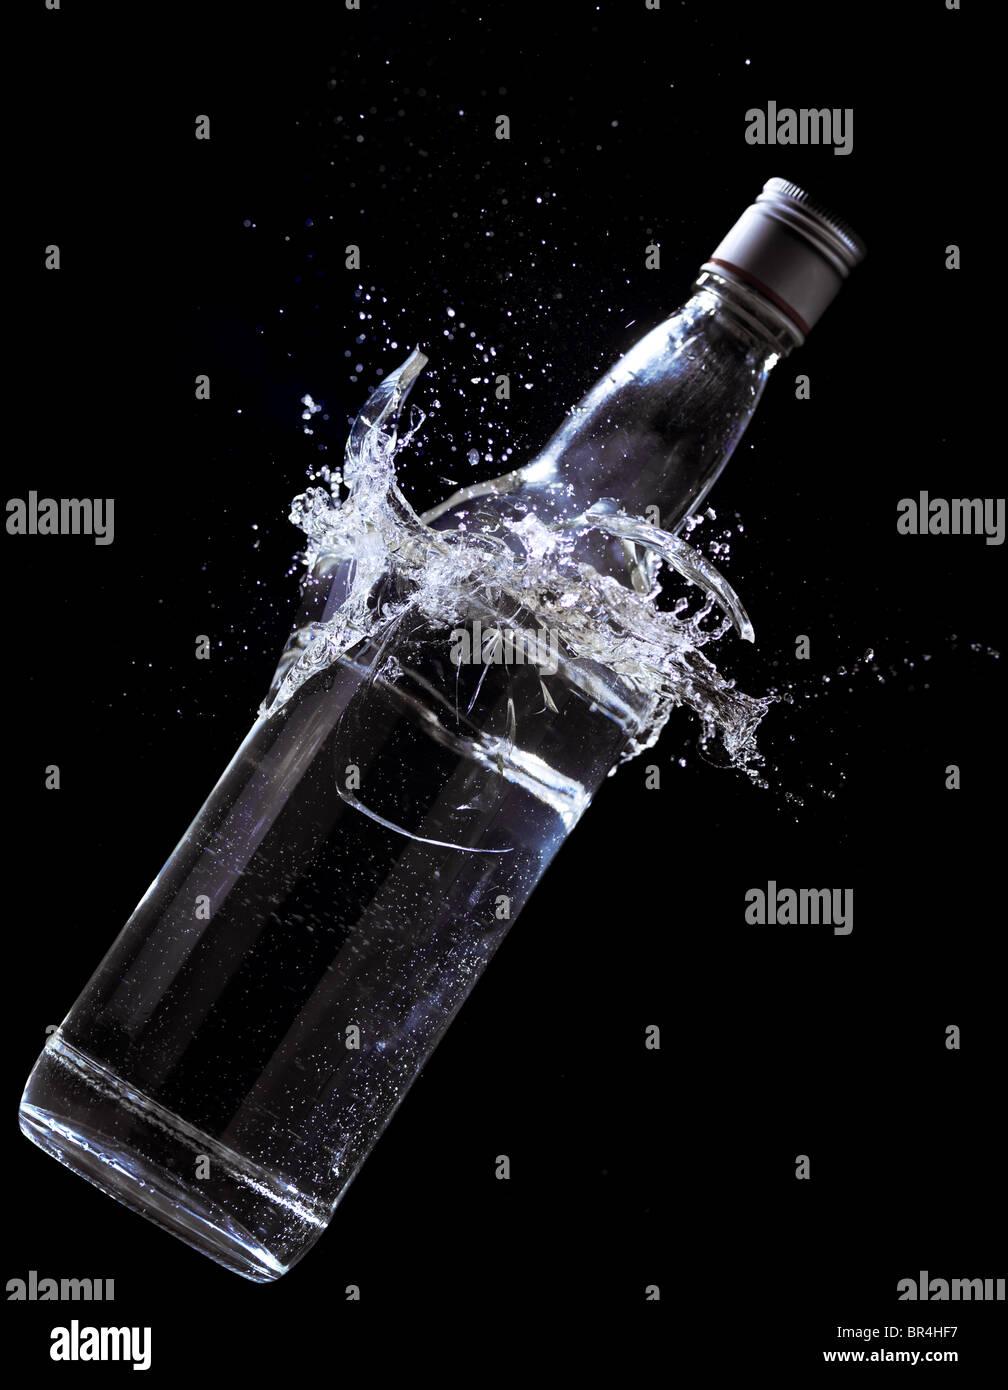 Alcohol bottle breaking - Stock Image